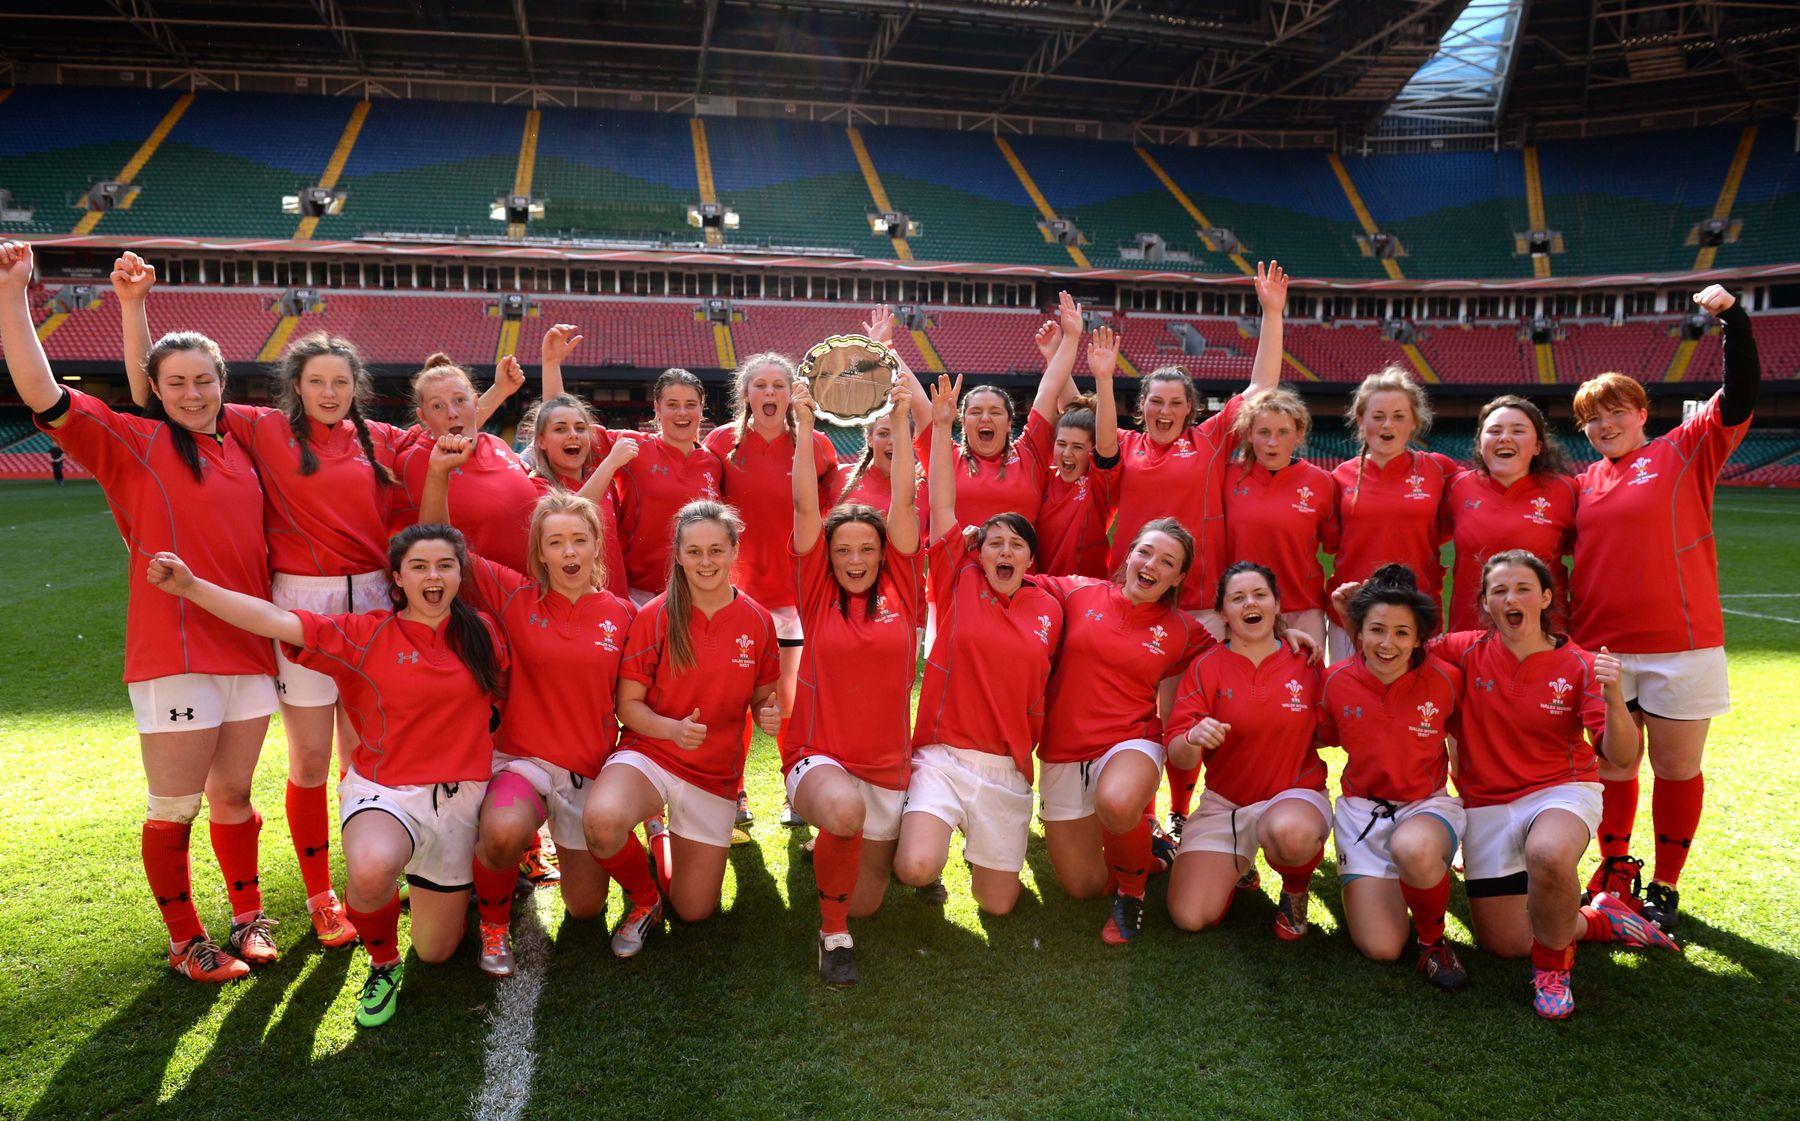 West Wales U18 surge to victory